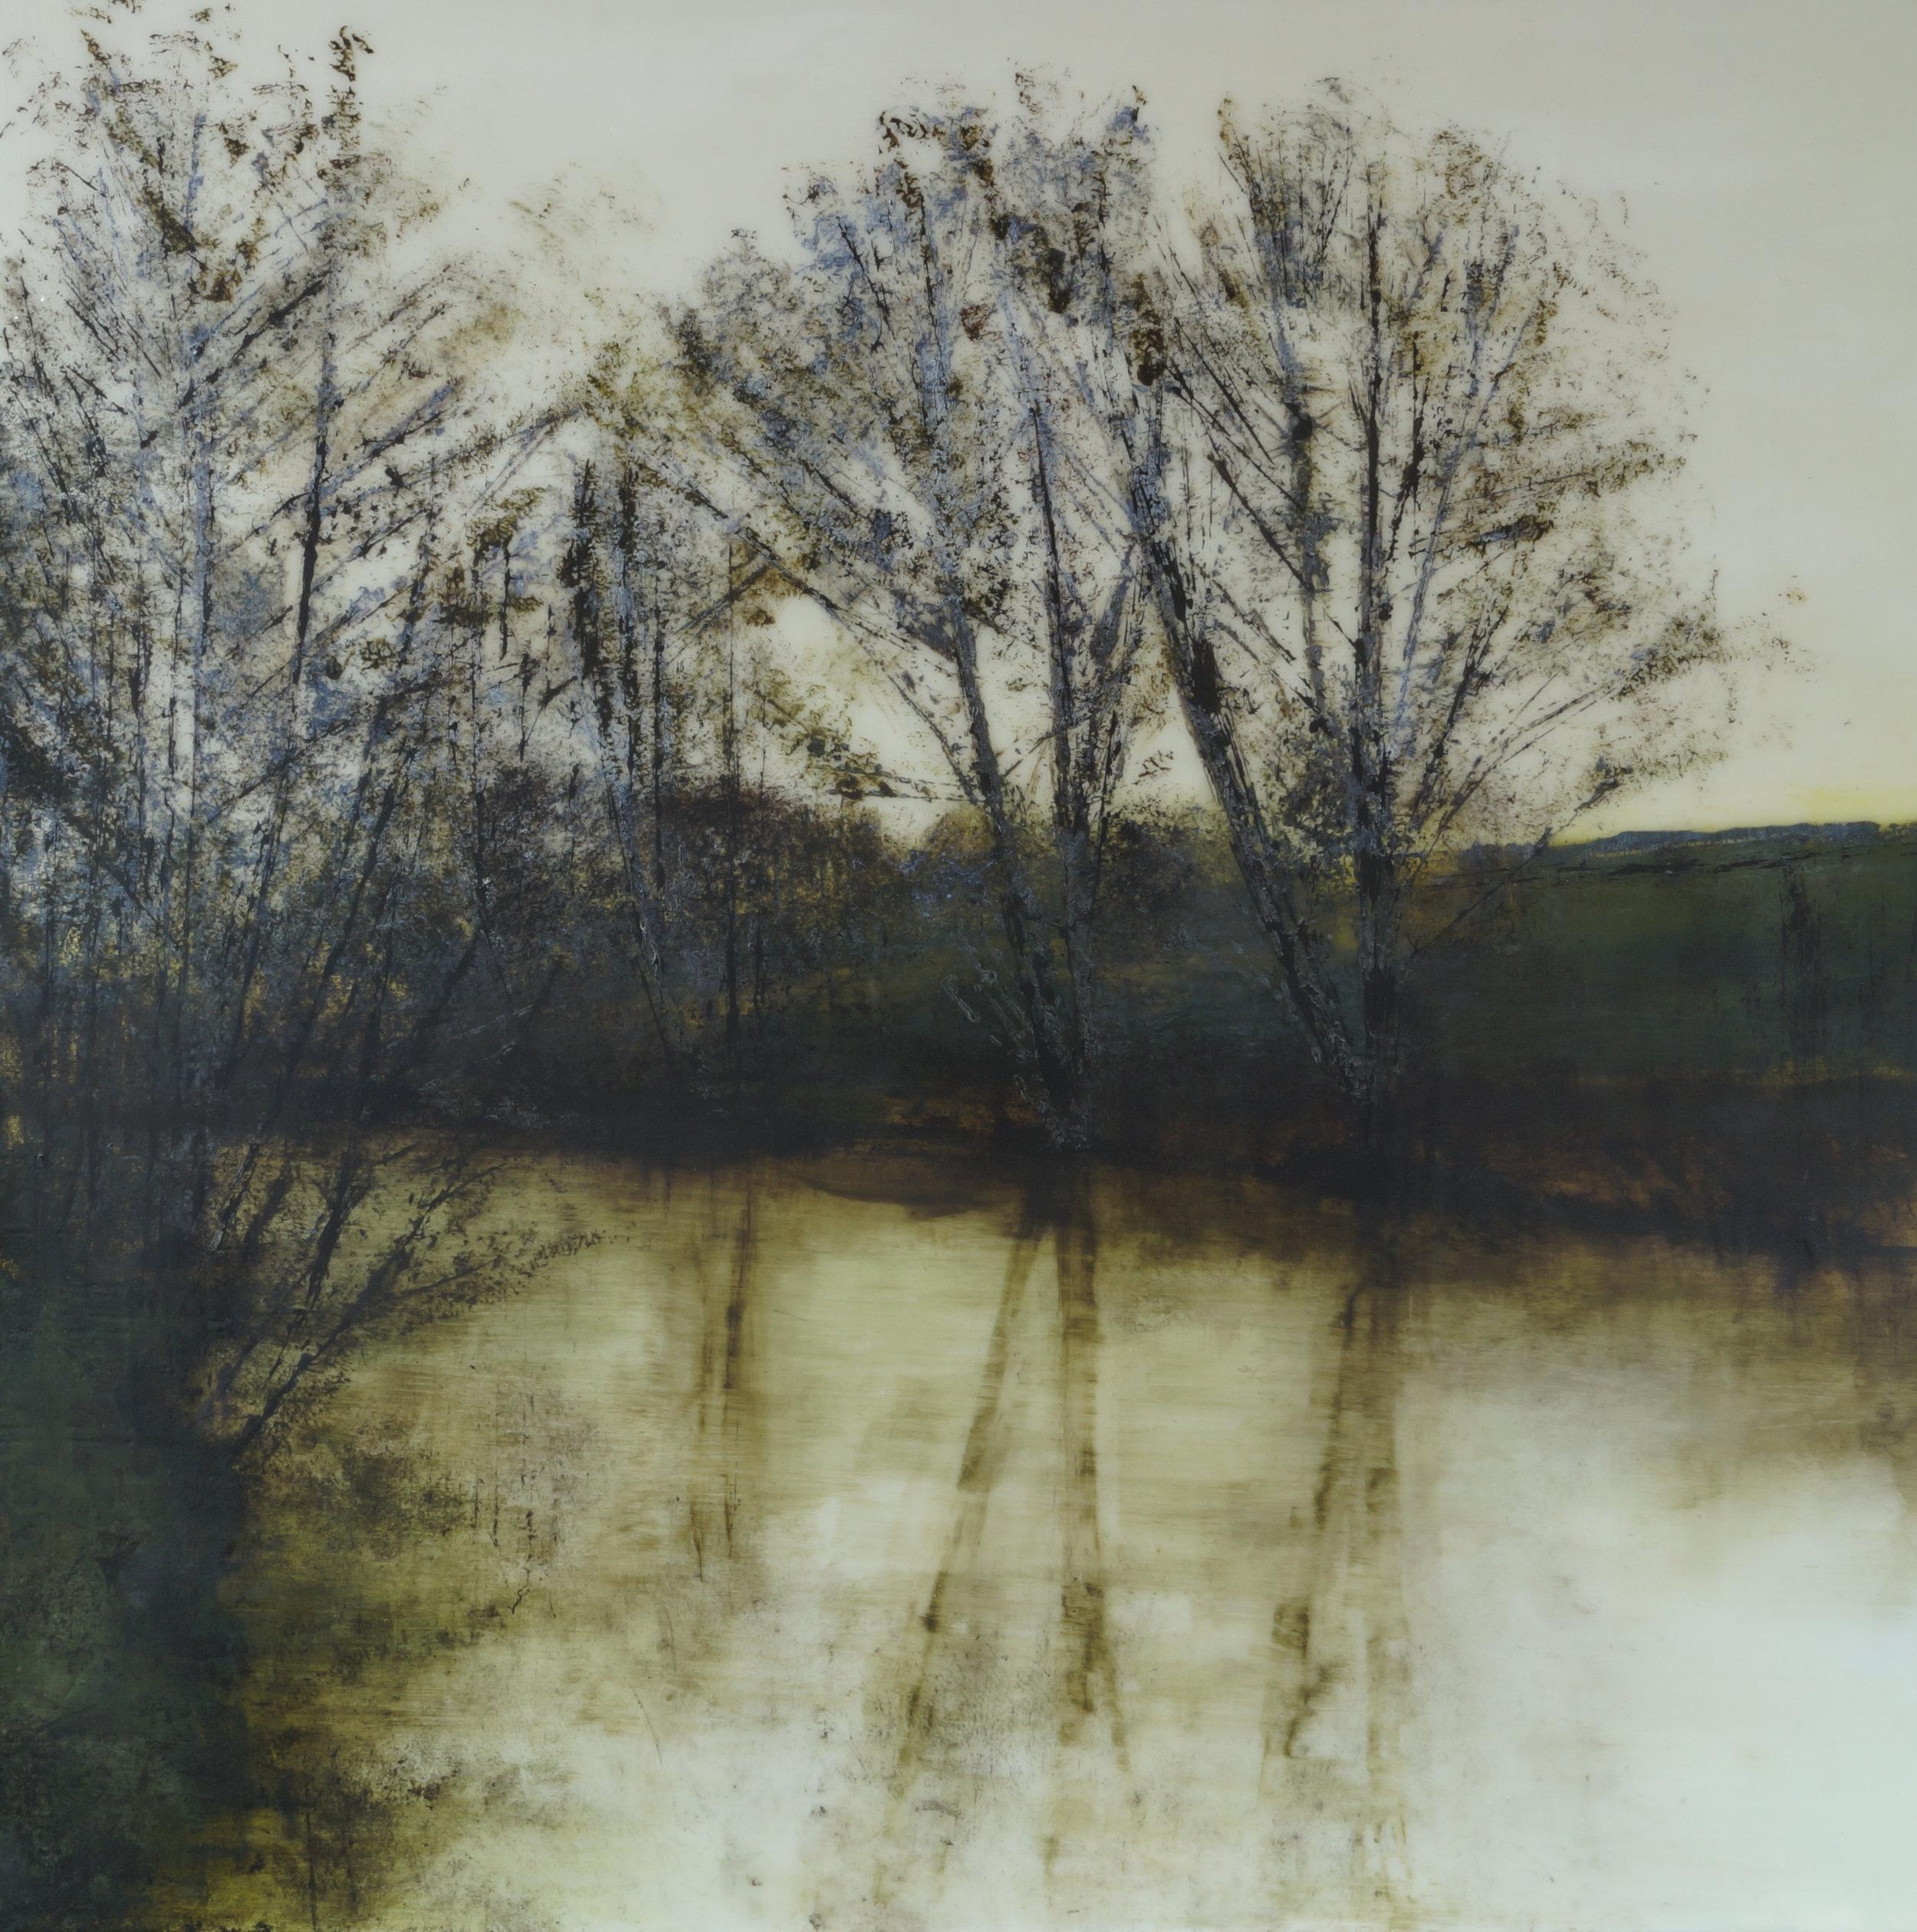 Title: Rain Reflections ize: 60 x 60 cm Medium:Acrylic and epoxy resin on canvas